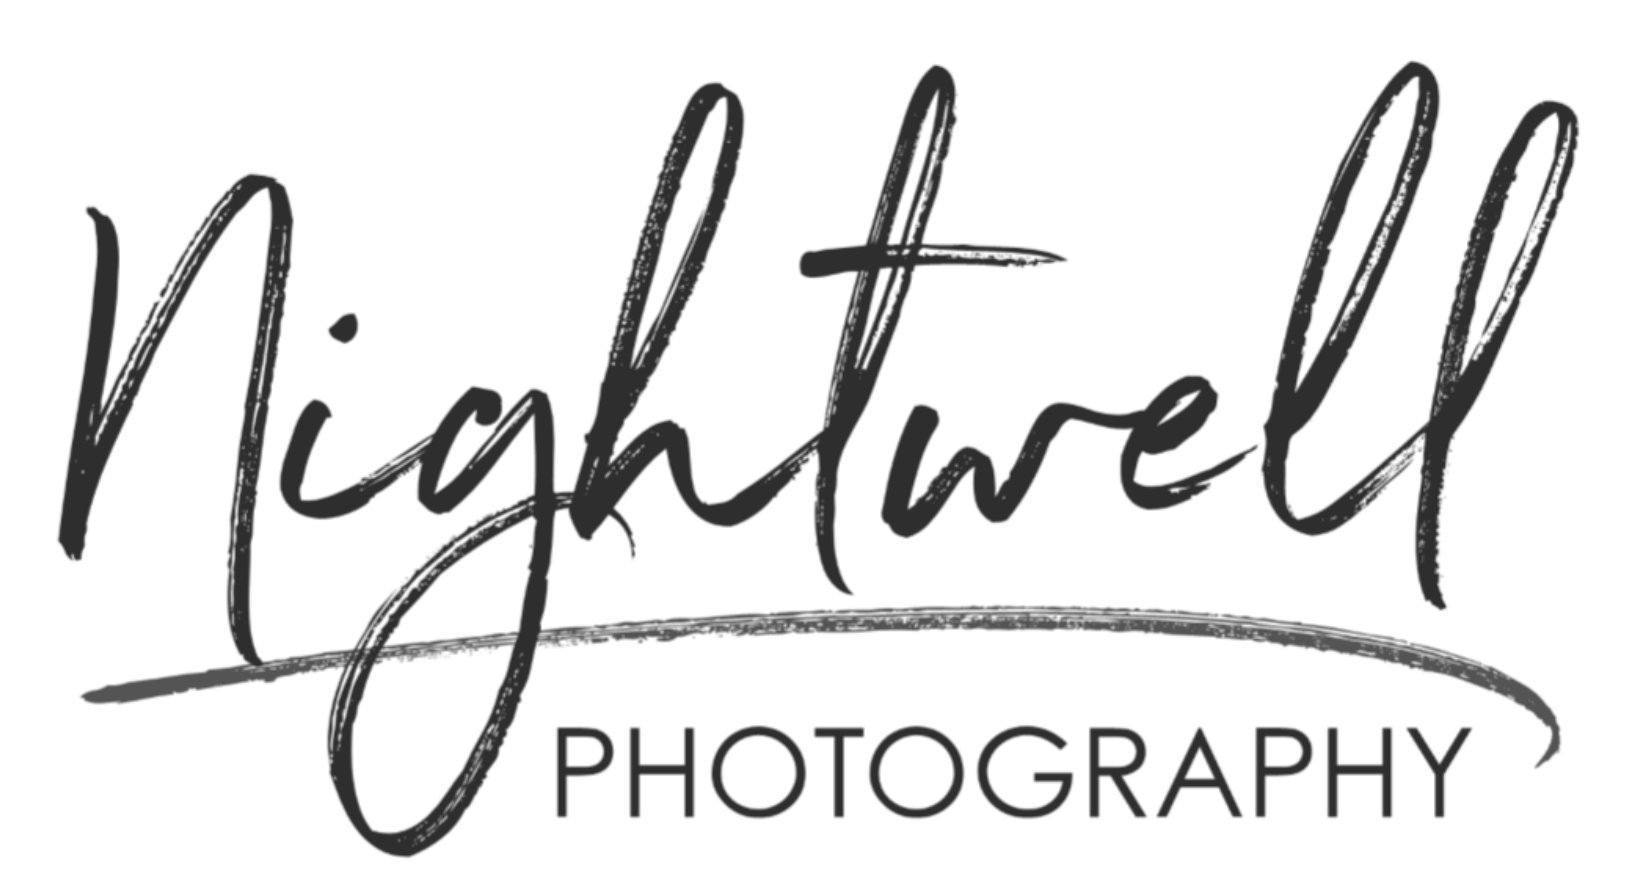 Nightwell Photography